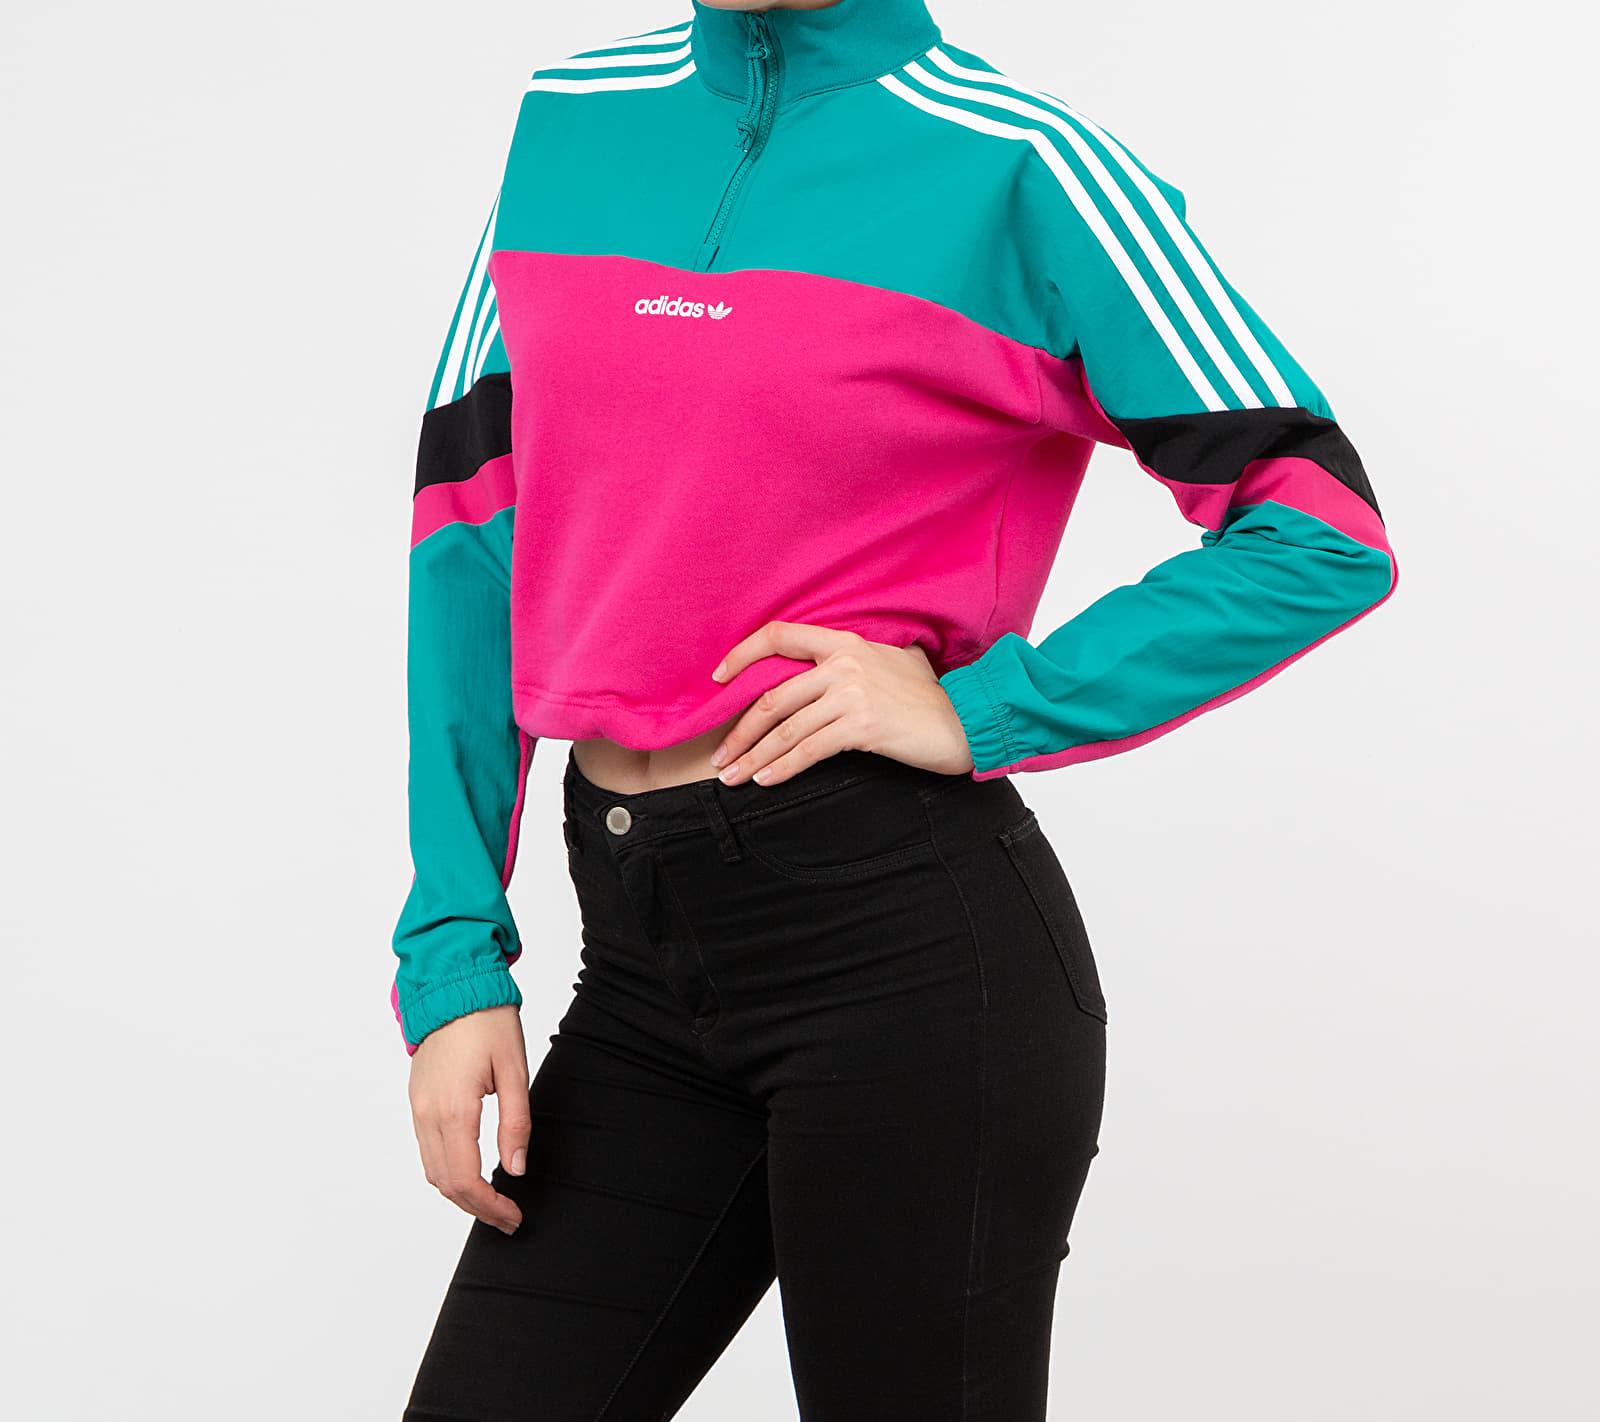 adidas Cropped Top Real Magenta/ Black Emerald, Pink